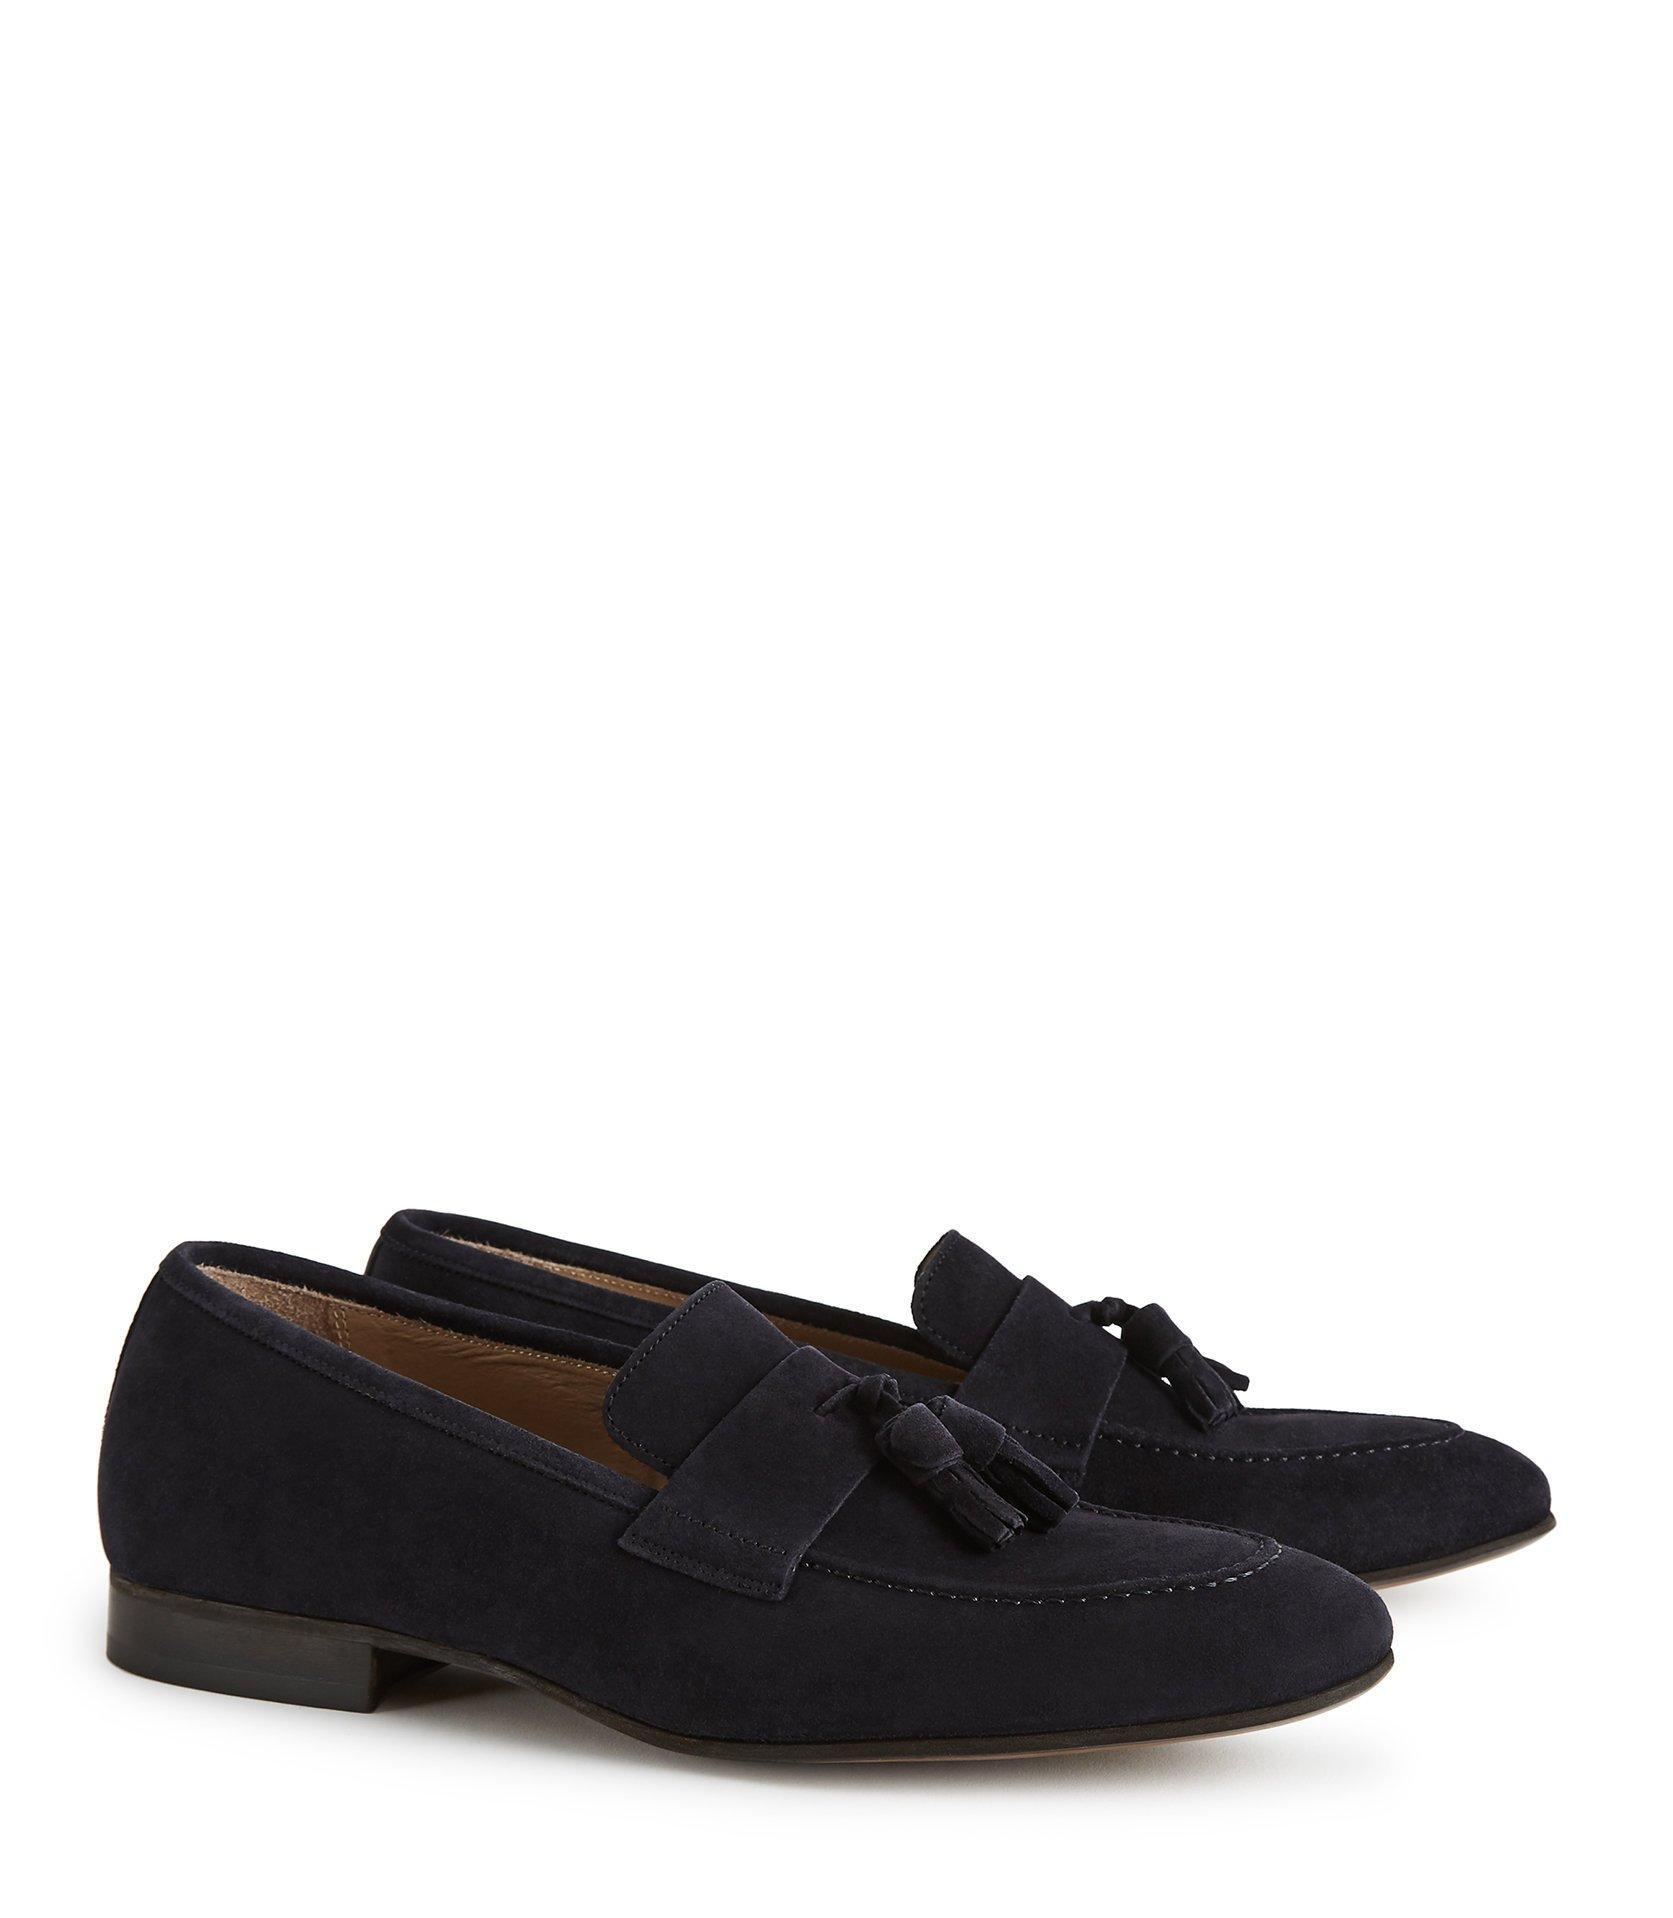 Reiss Thorpe - Suede Tassel Loafers in Navy (Blue) for Men